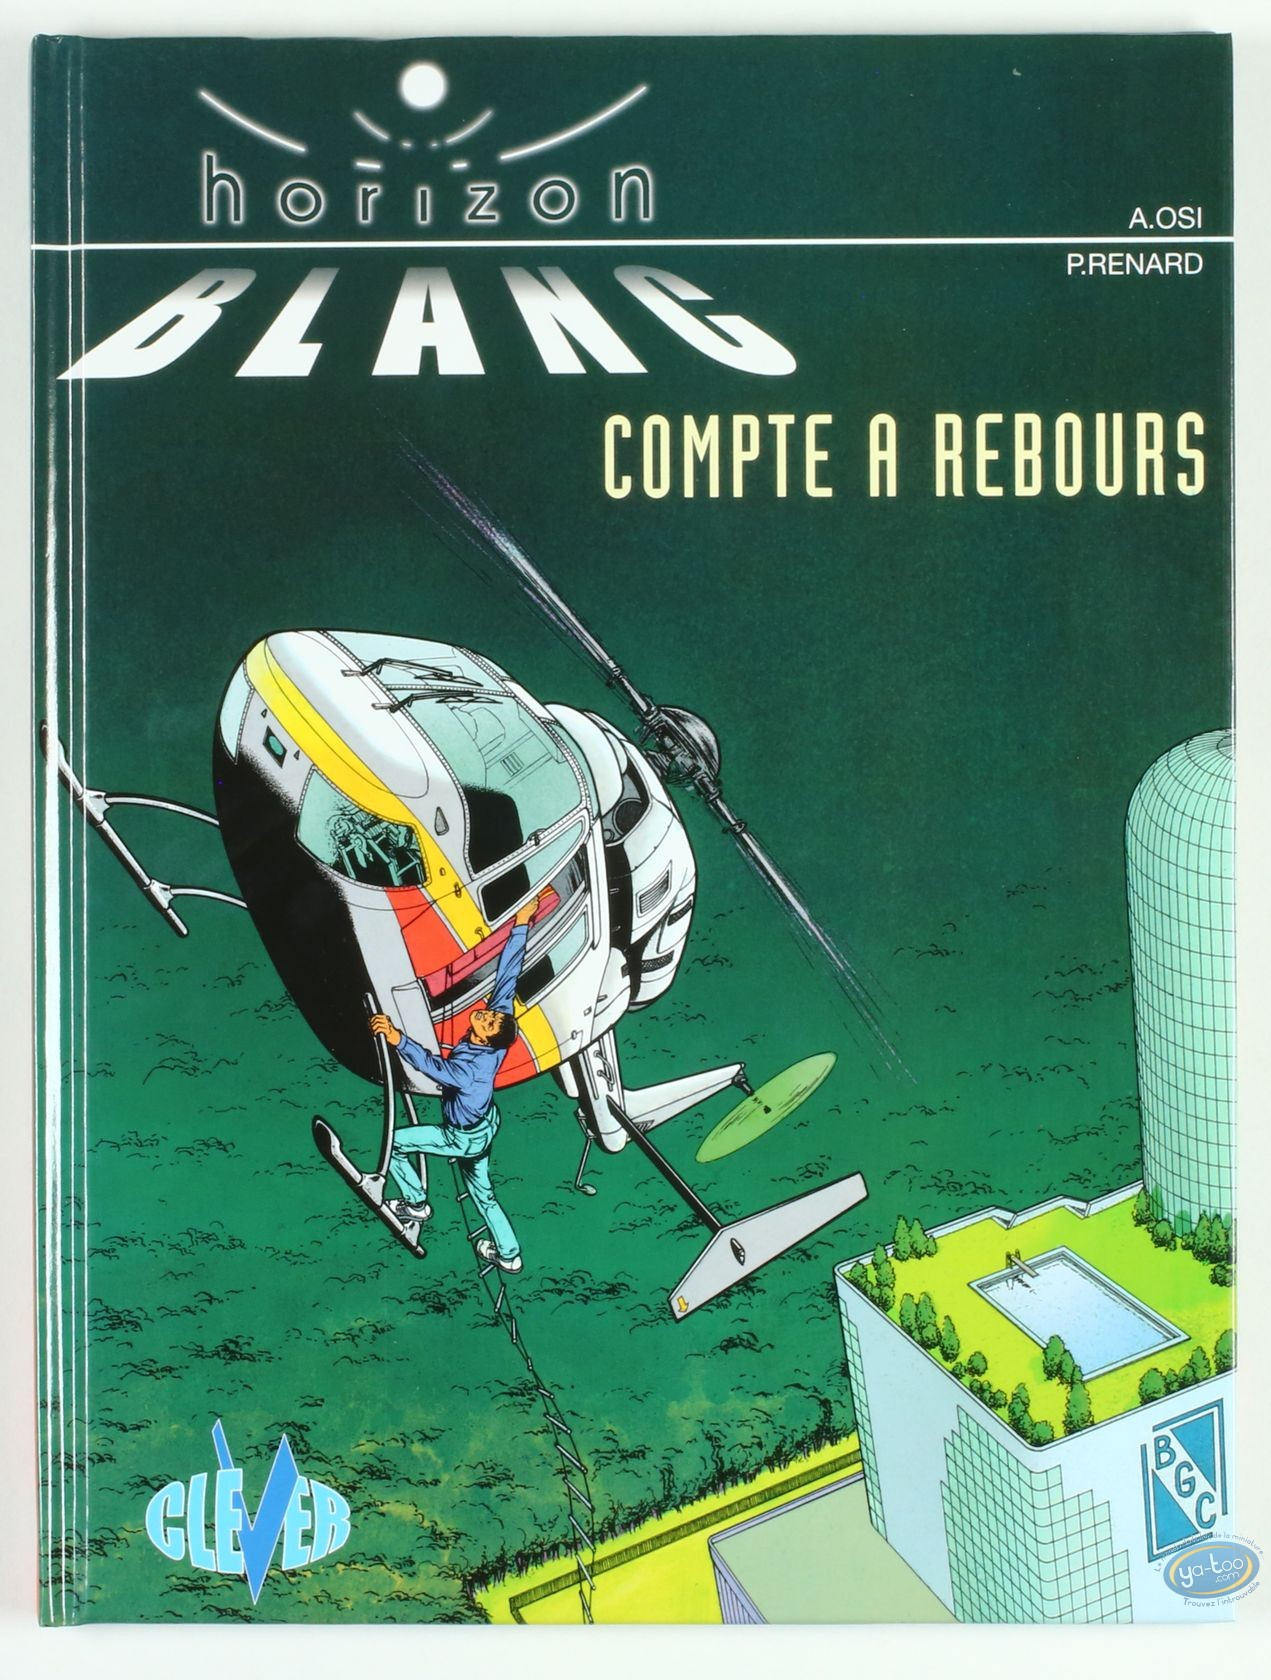 Reduced price European comic books, Horizon Blanc : Compte a rebours